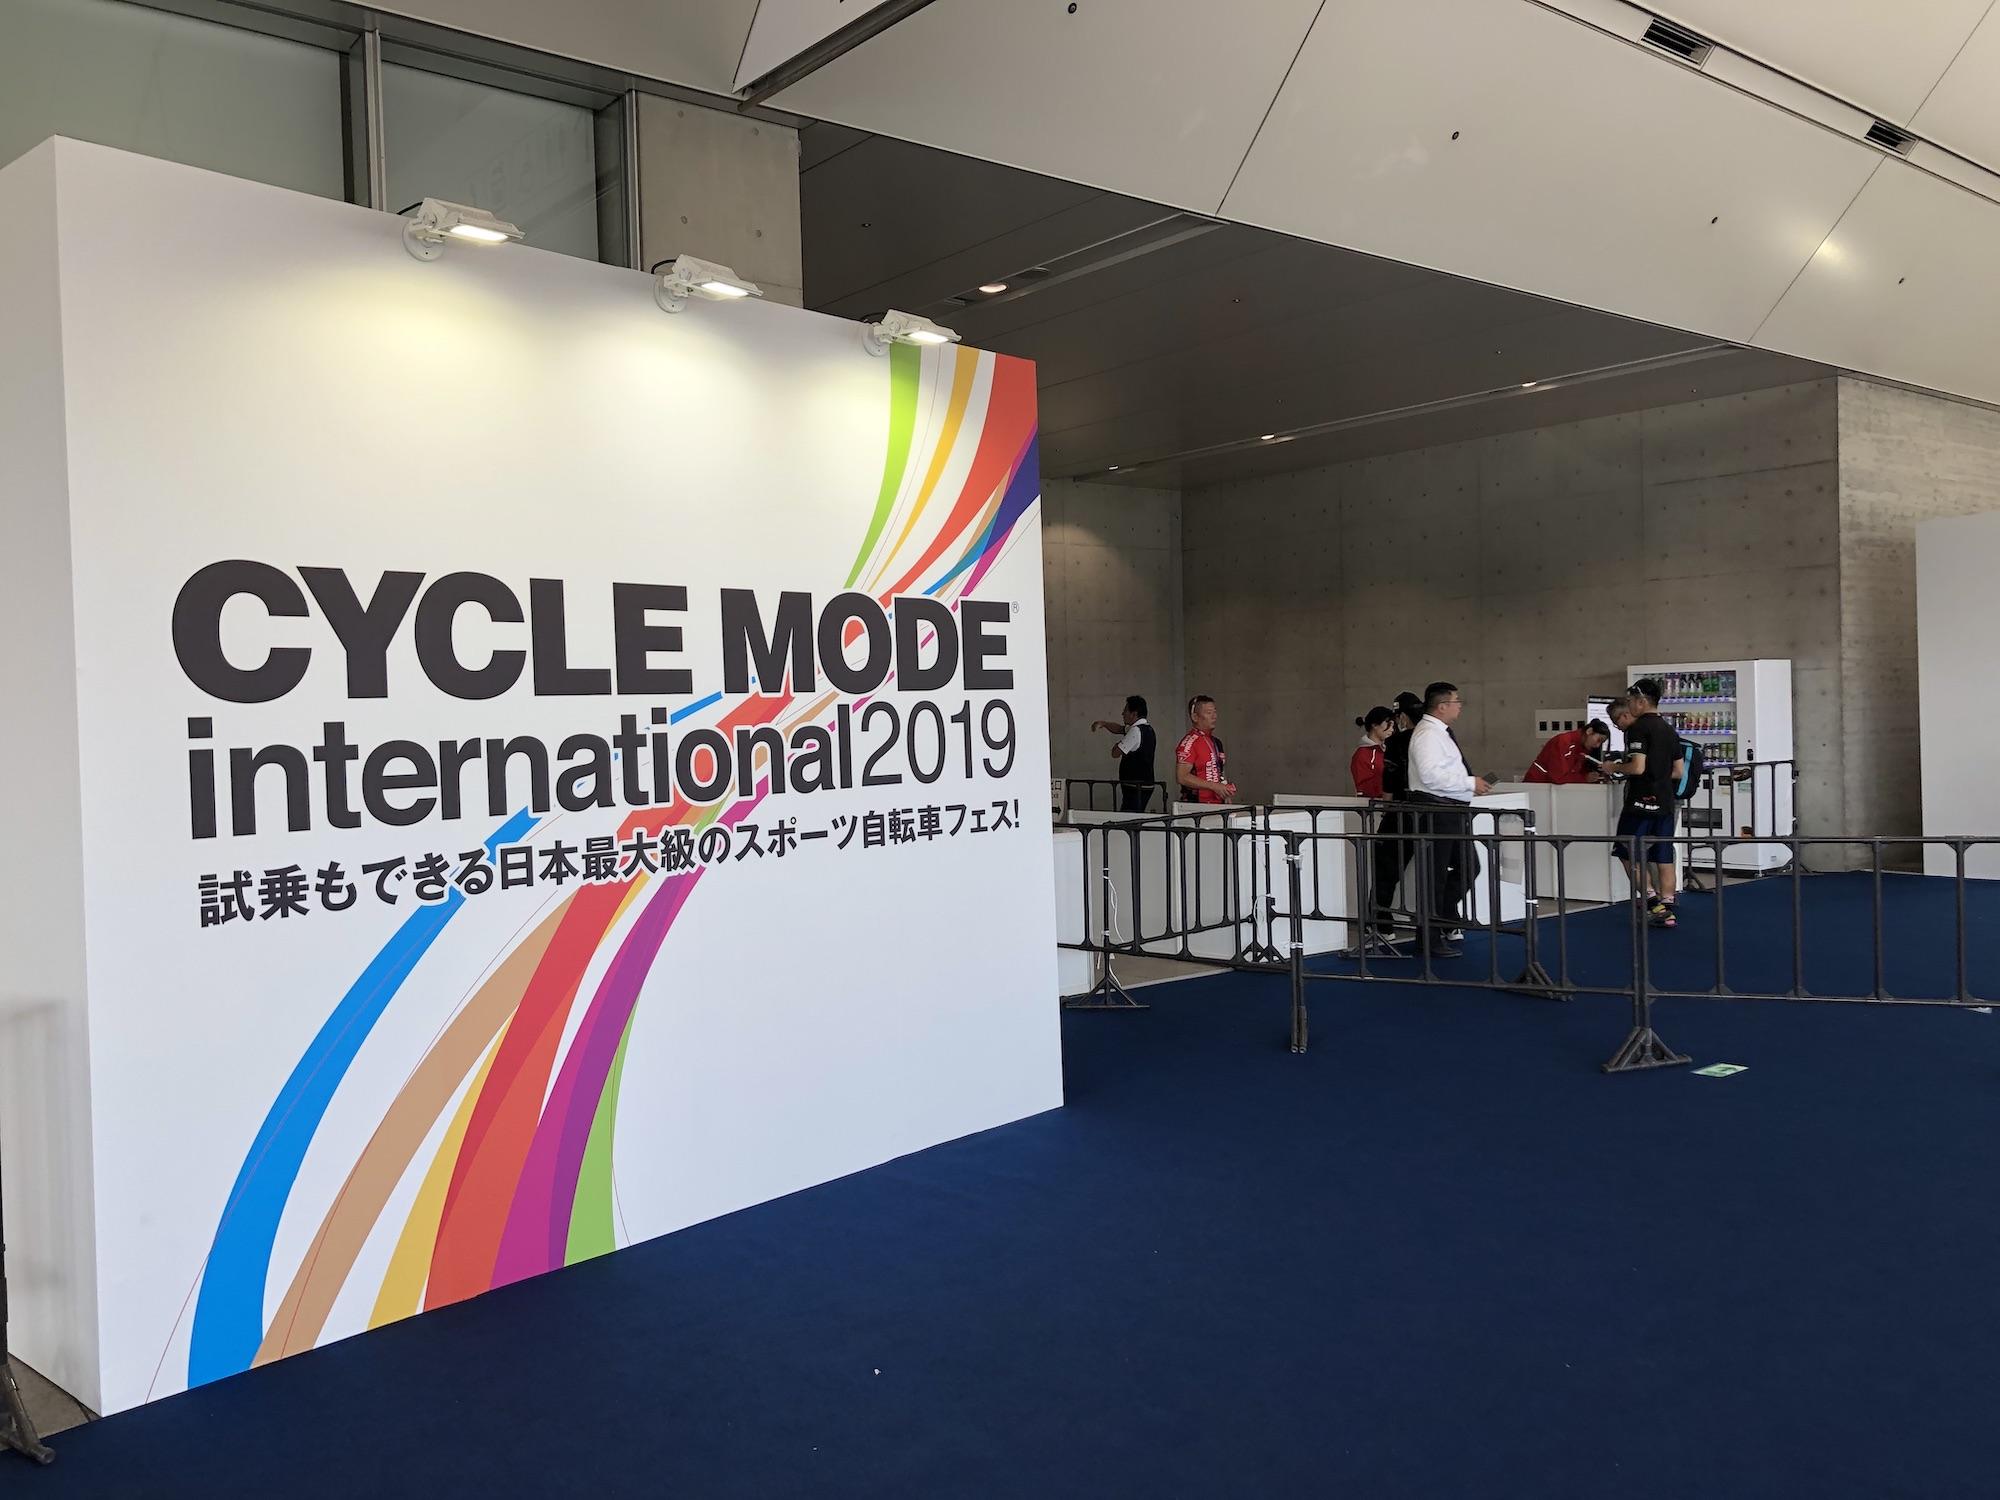 cyclemode2019 2